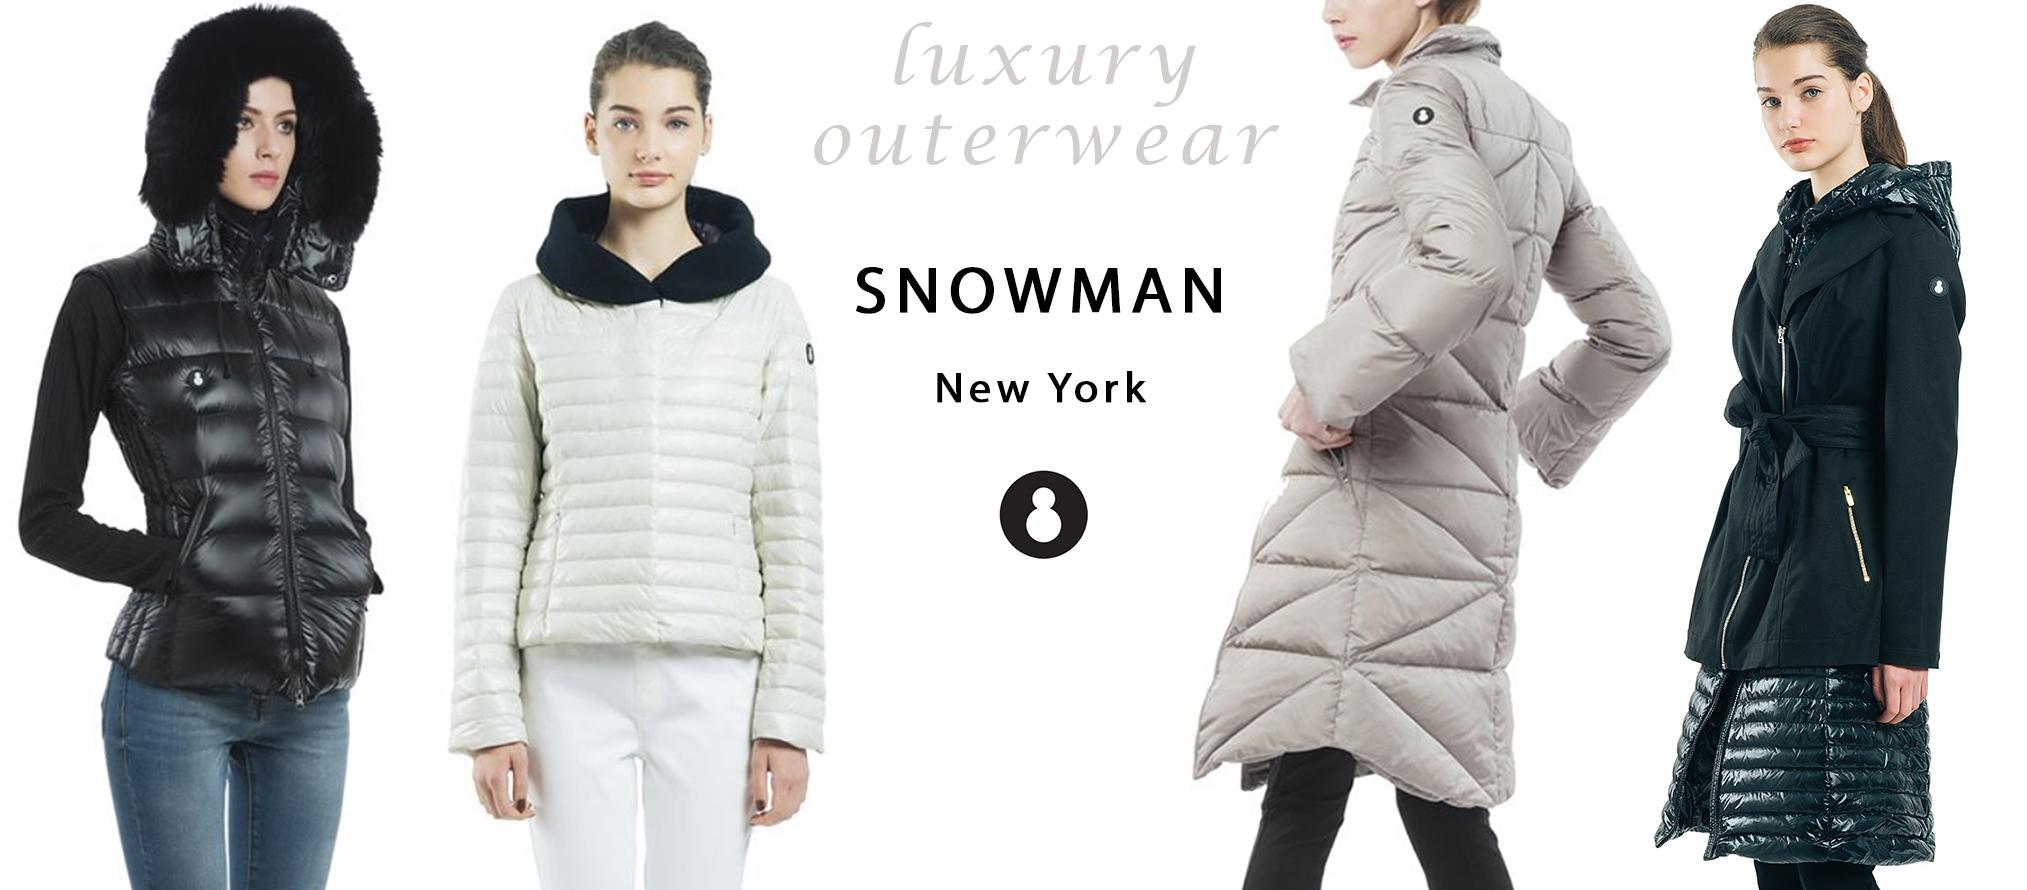 Snowman New York